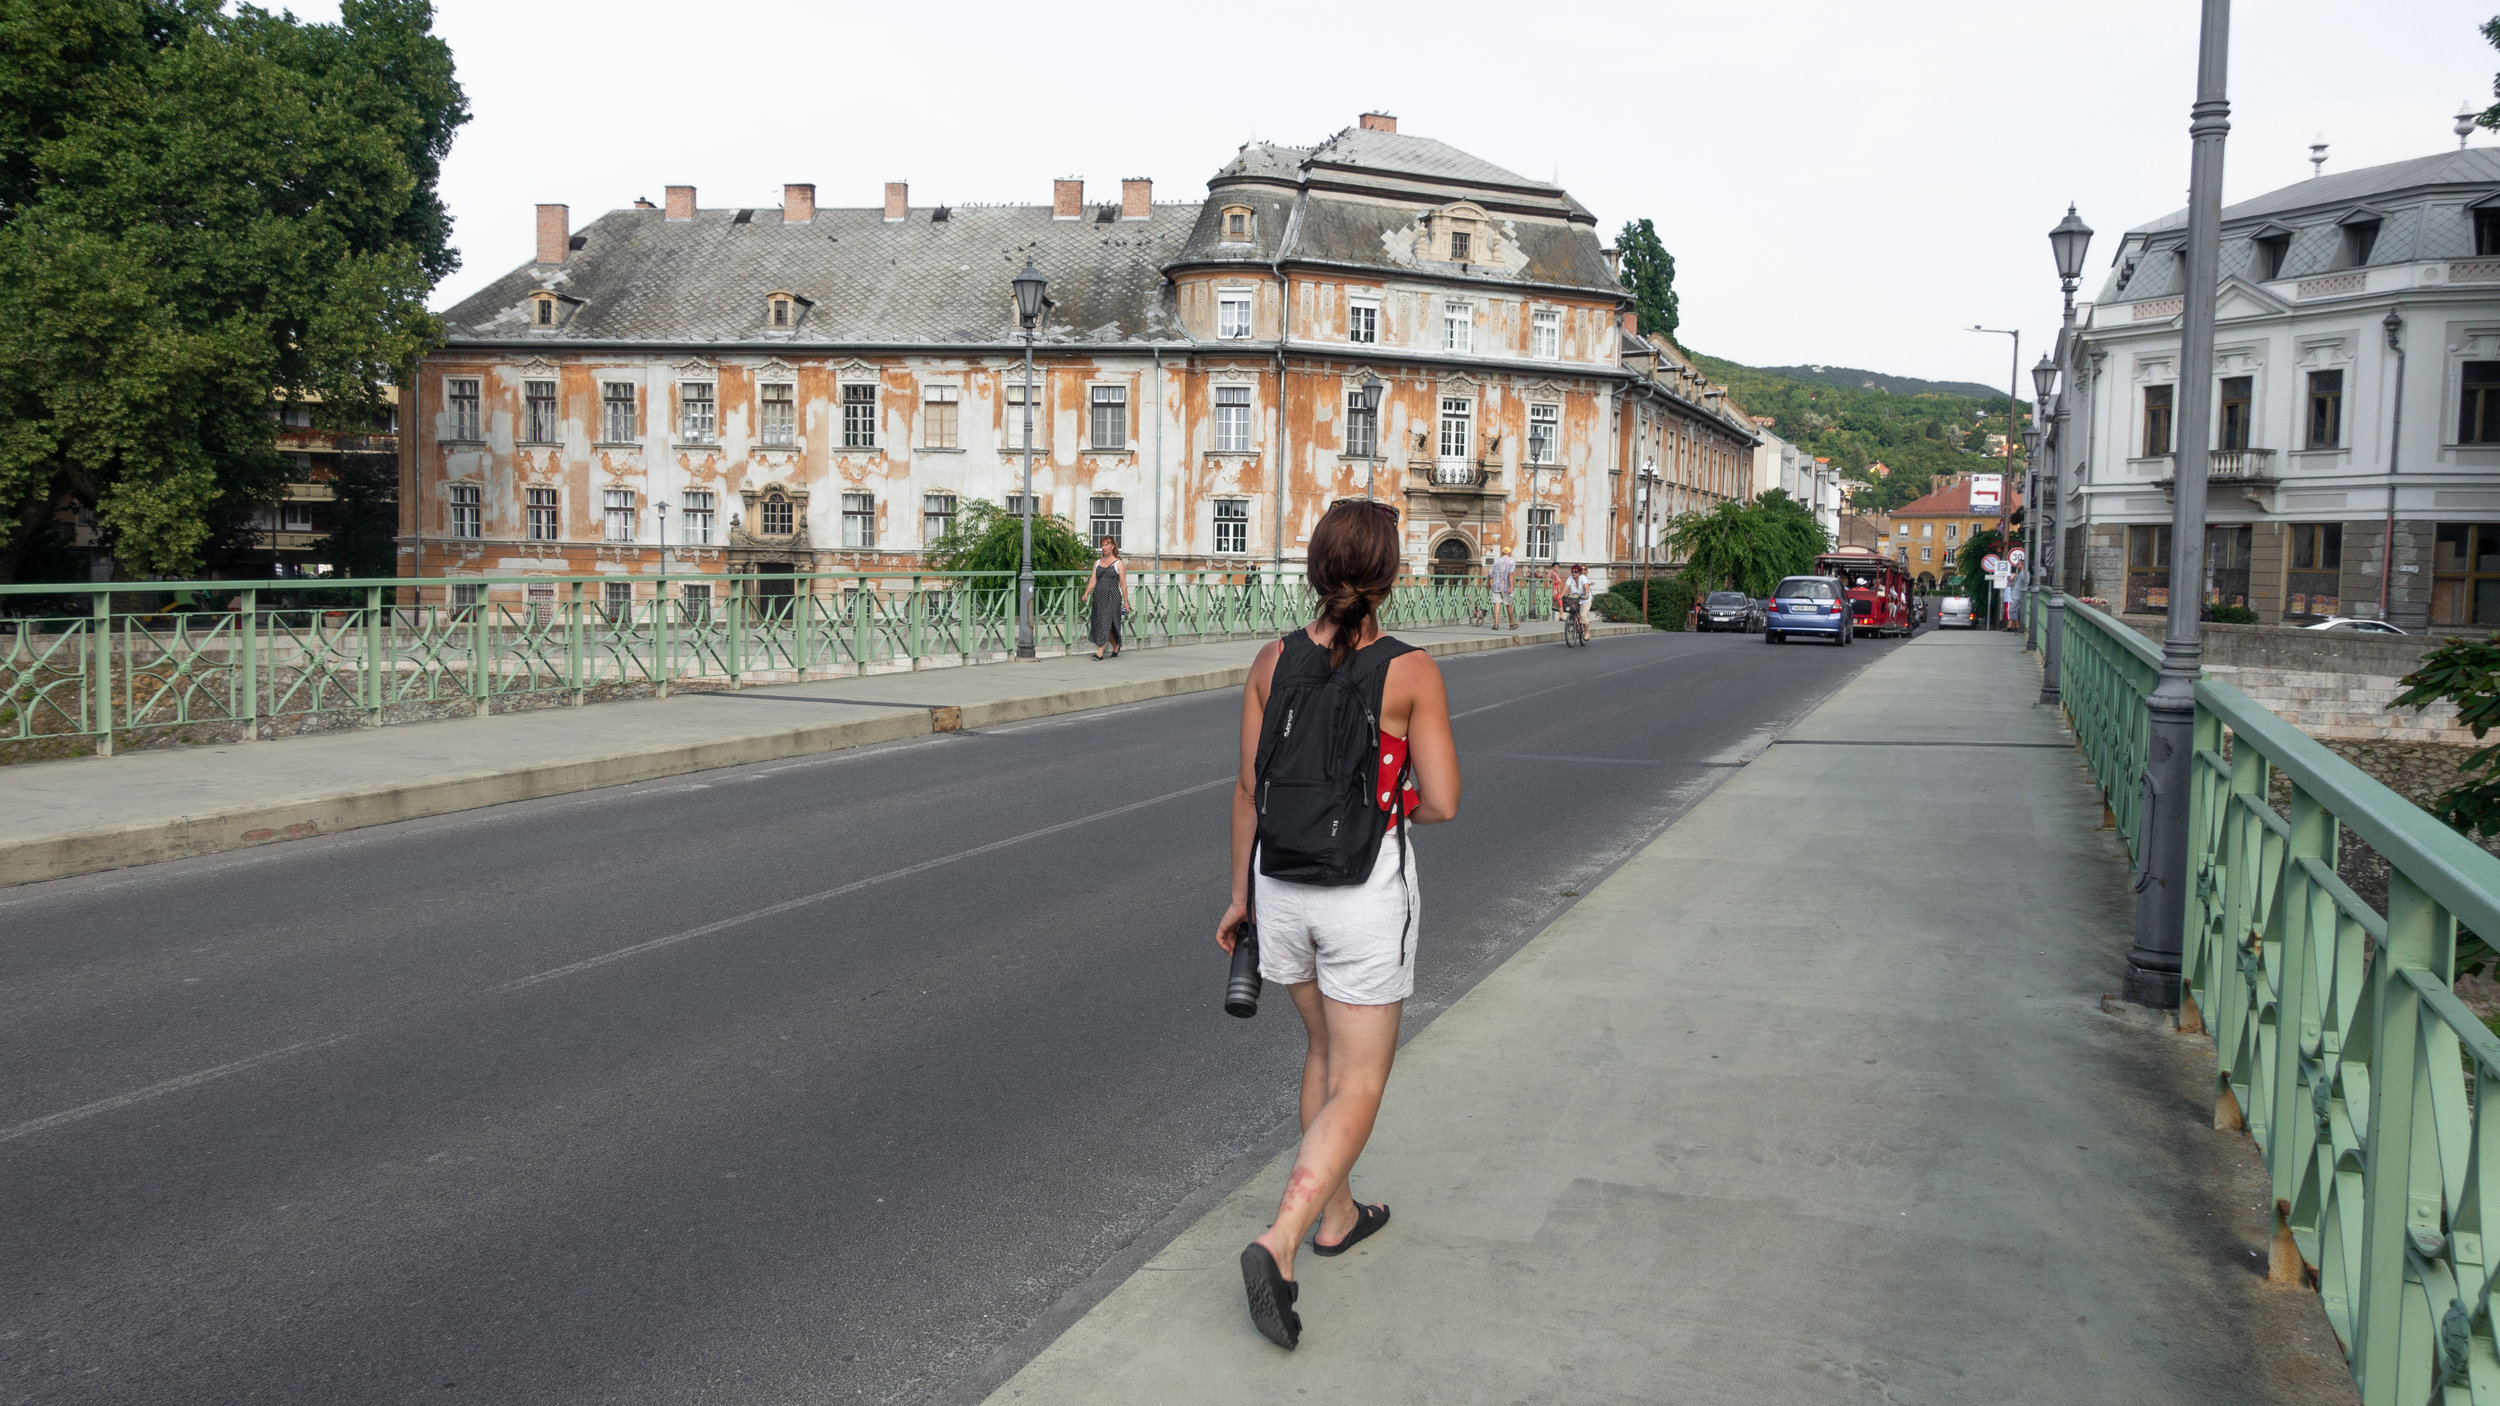 Wandering the streets of Esztergom